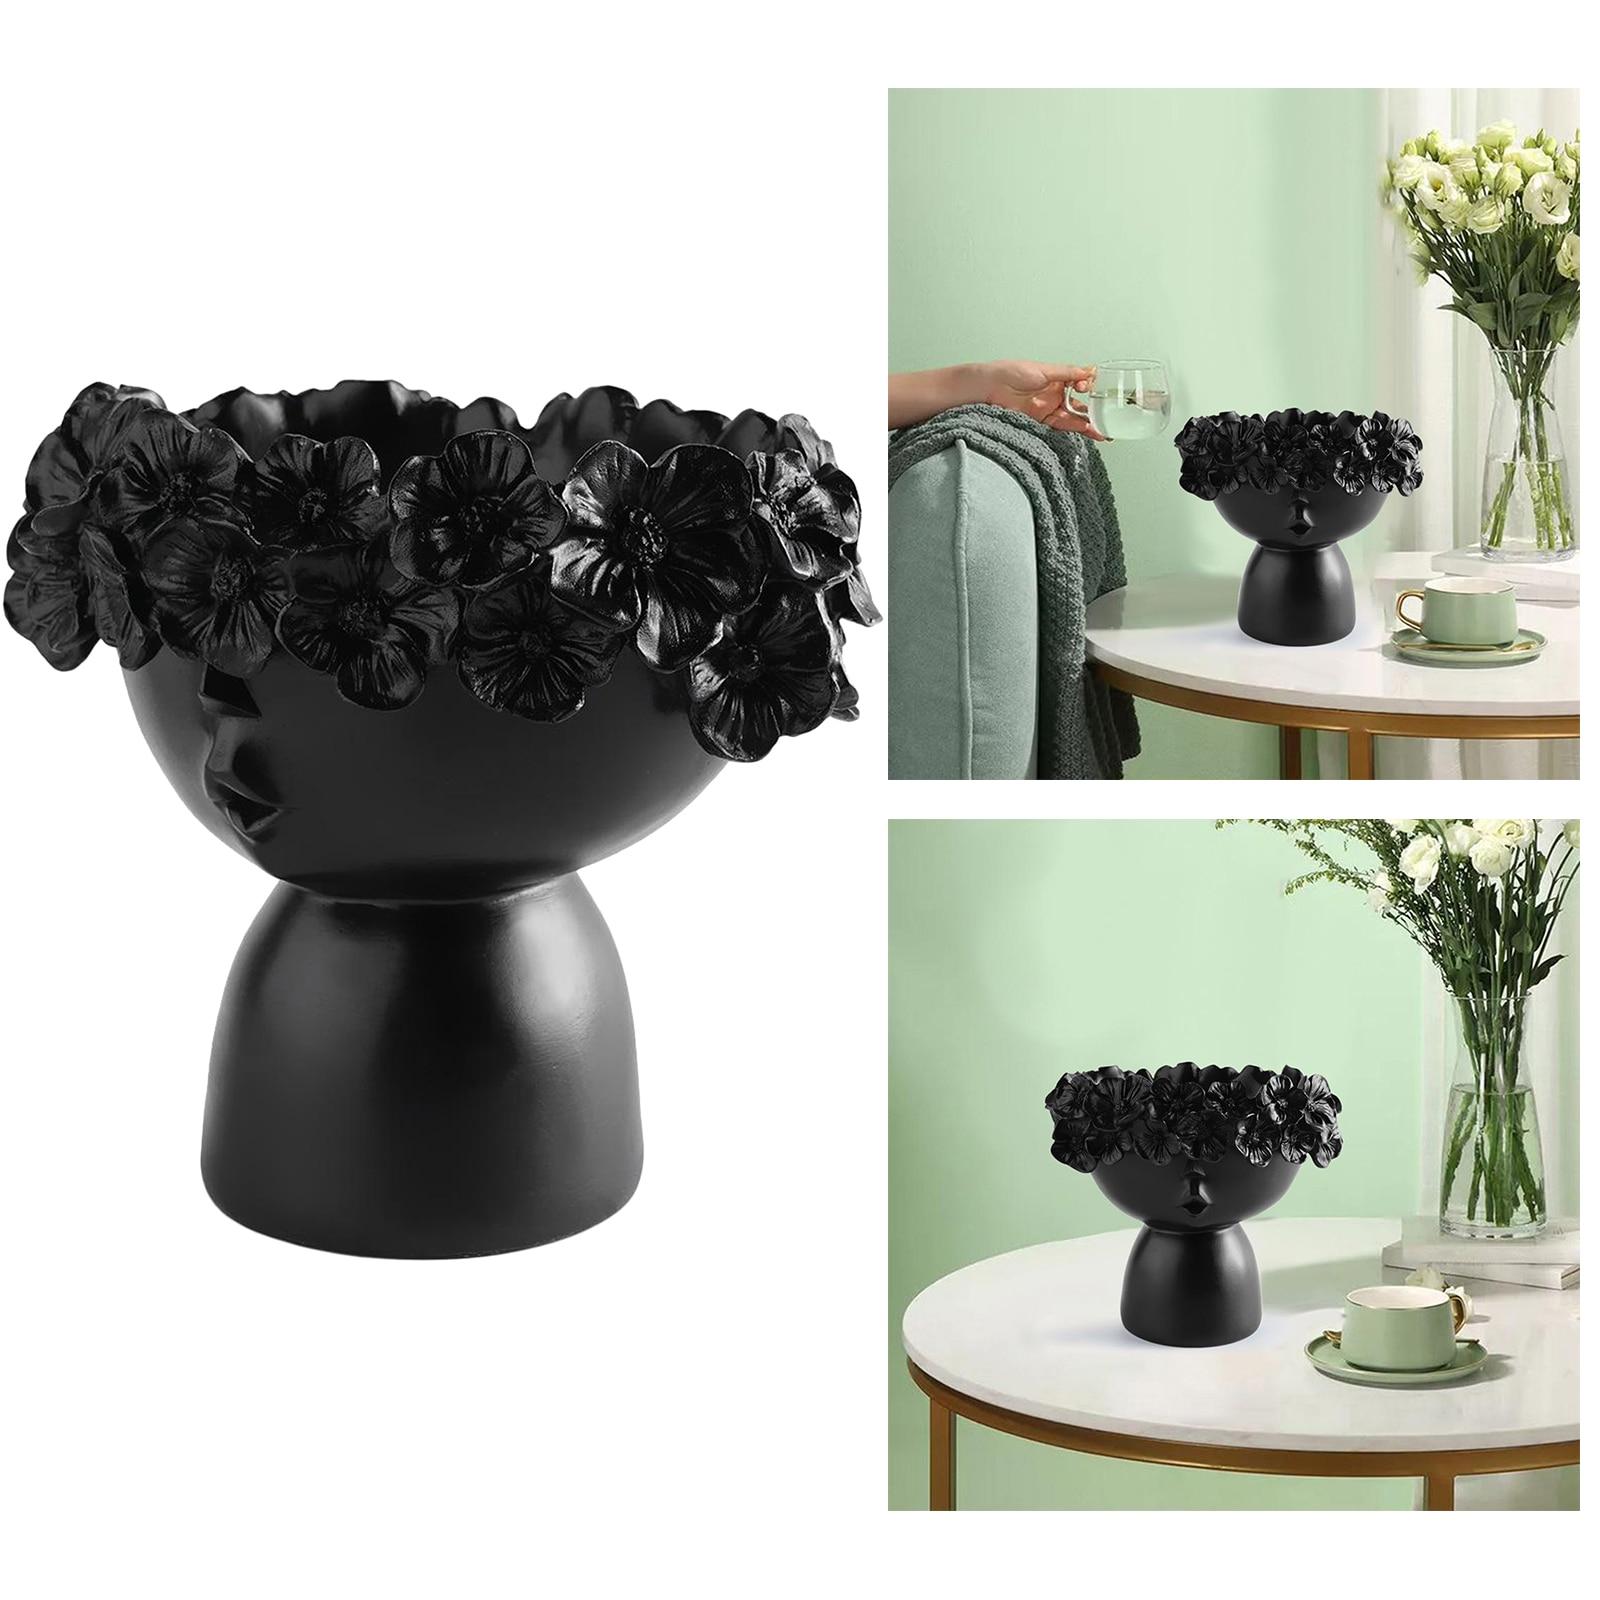 Rsin Mini Nordic Style суккулент растение горшок кактус растение горшок цветок горшок контейнер кашпо